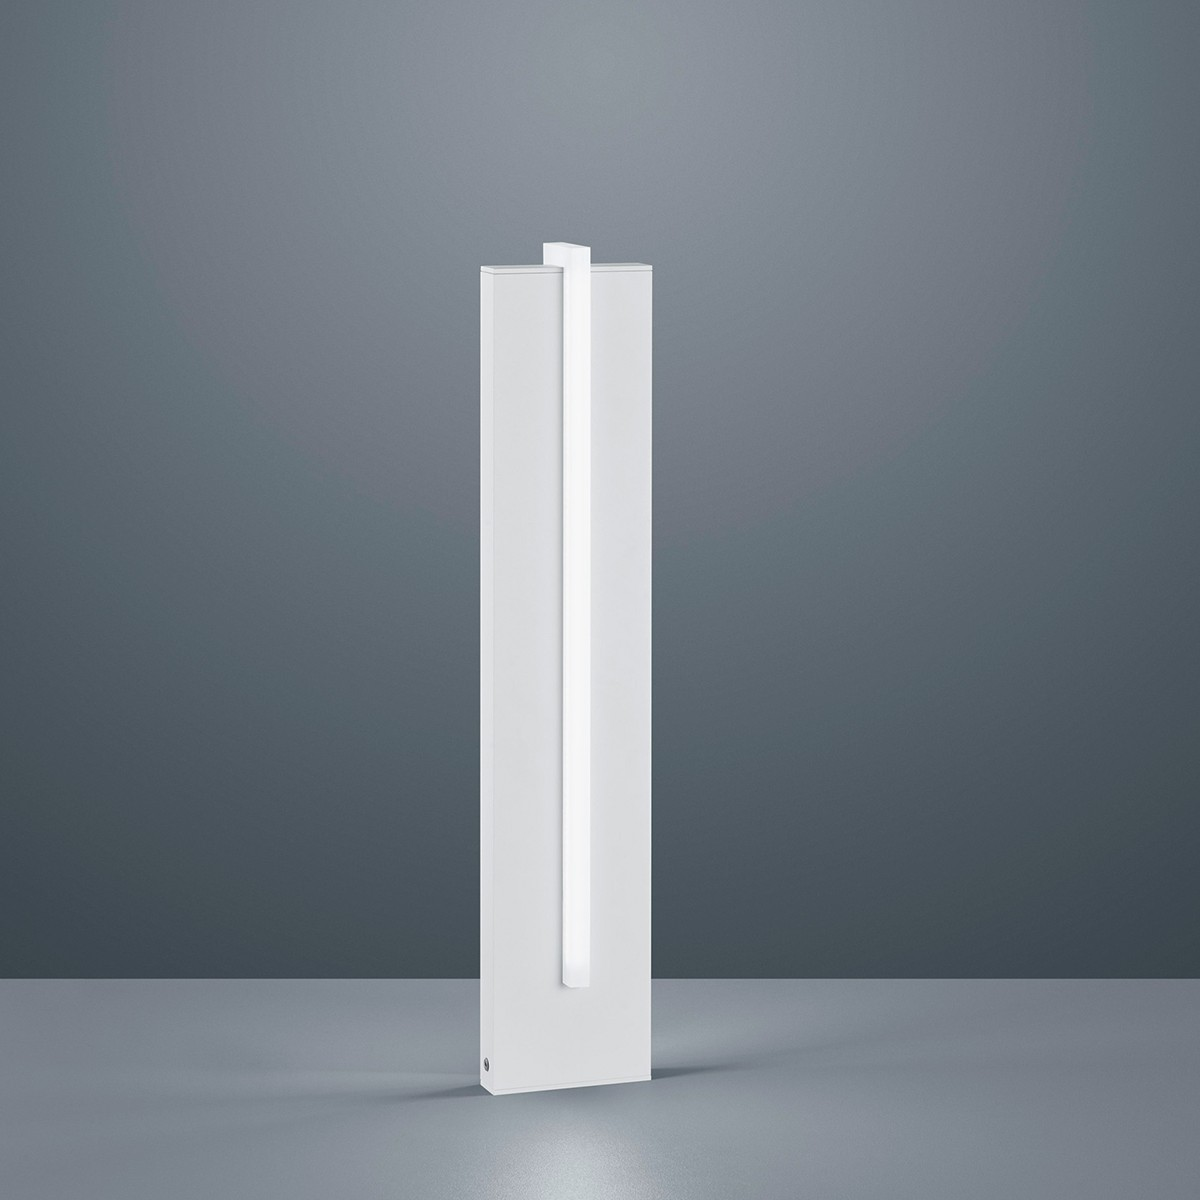 Helestra Oki LED Pollerleuchte, weiß matt